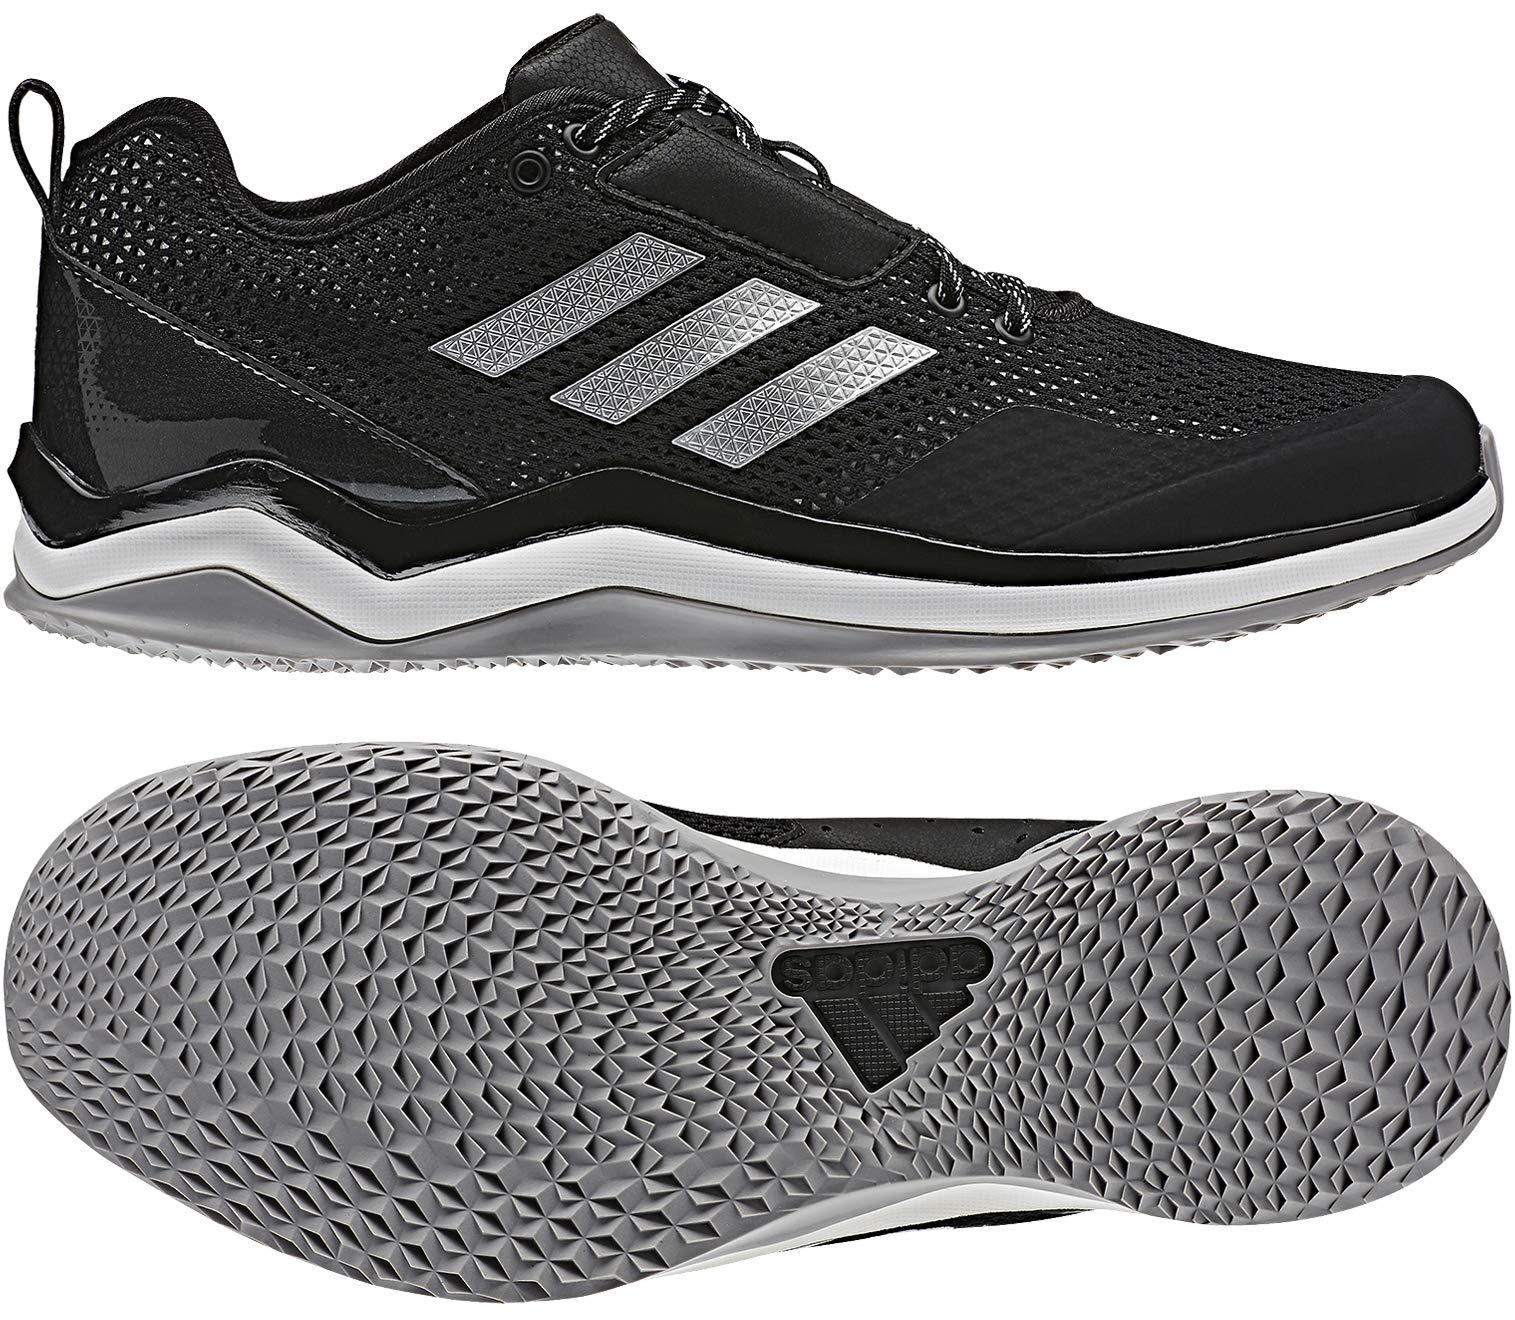 brand new 48702 e9dce Galleon - Adidas Men s Speed Trainer 3 Shoes, Black Metallic Silver White,  9 M US